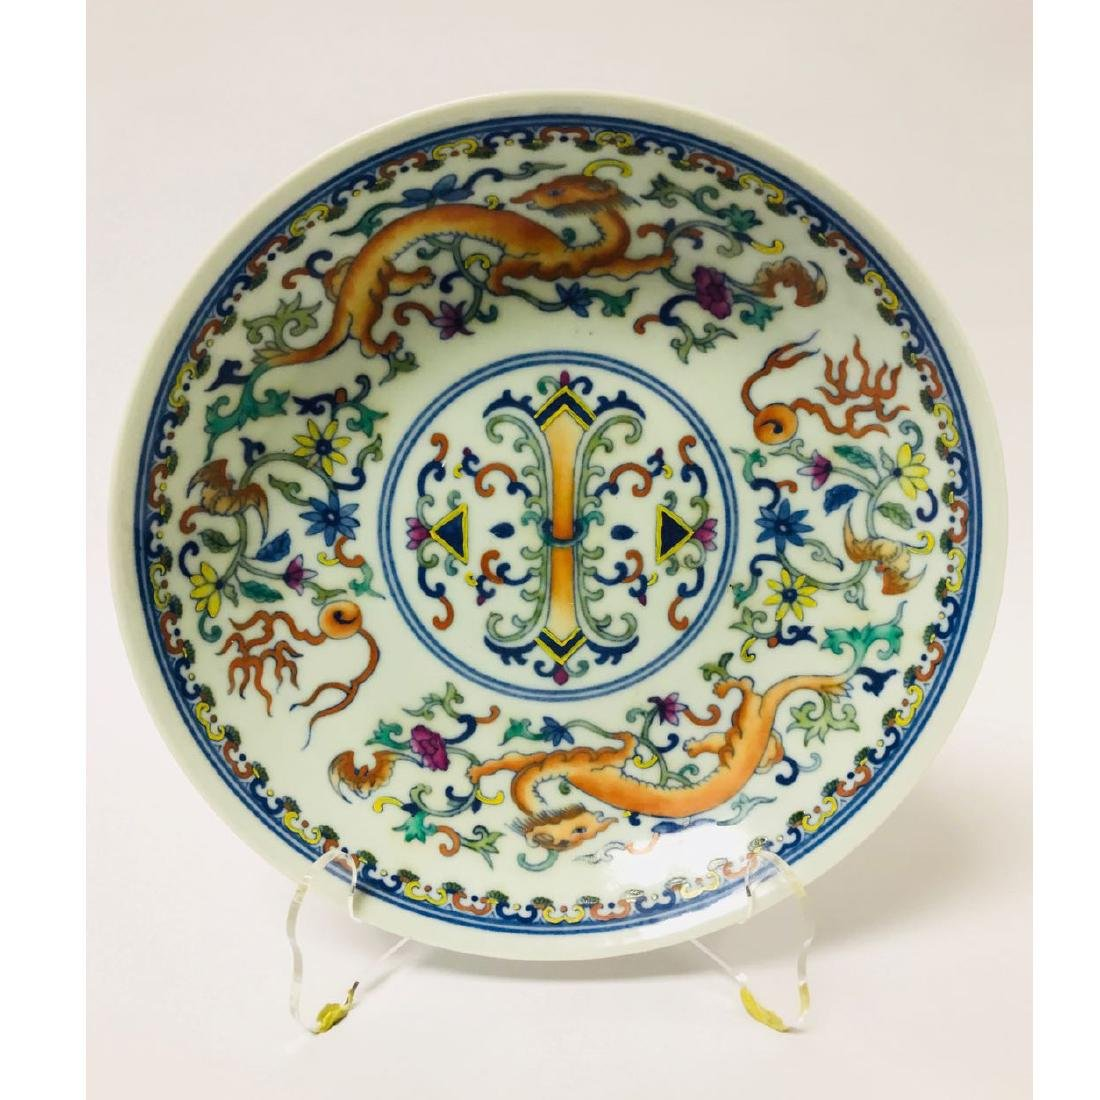 DouCai Porcelain Plate